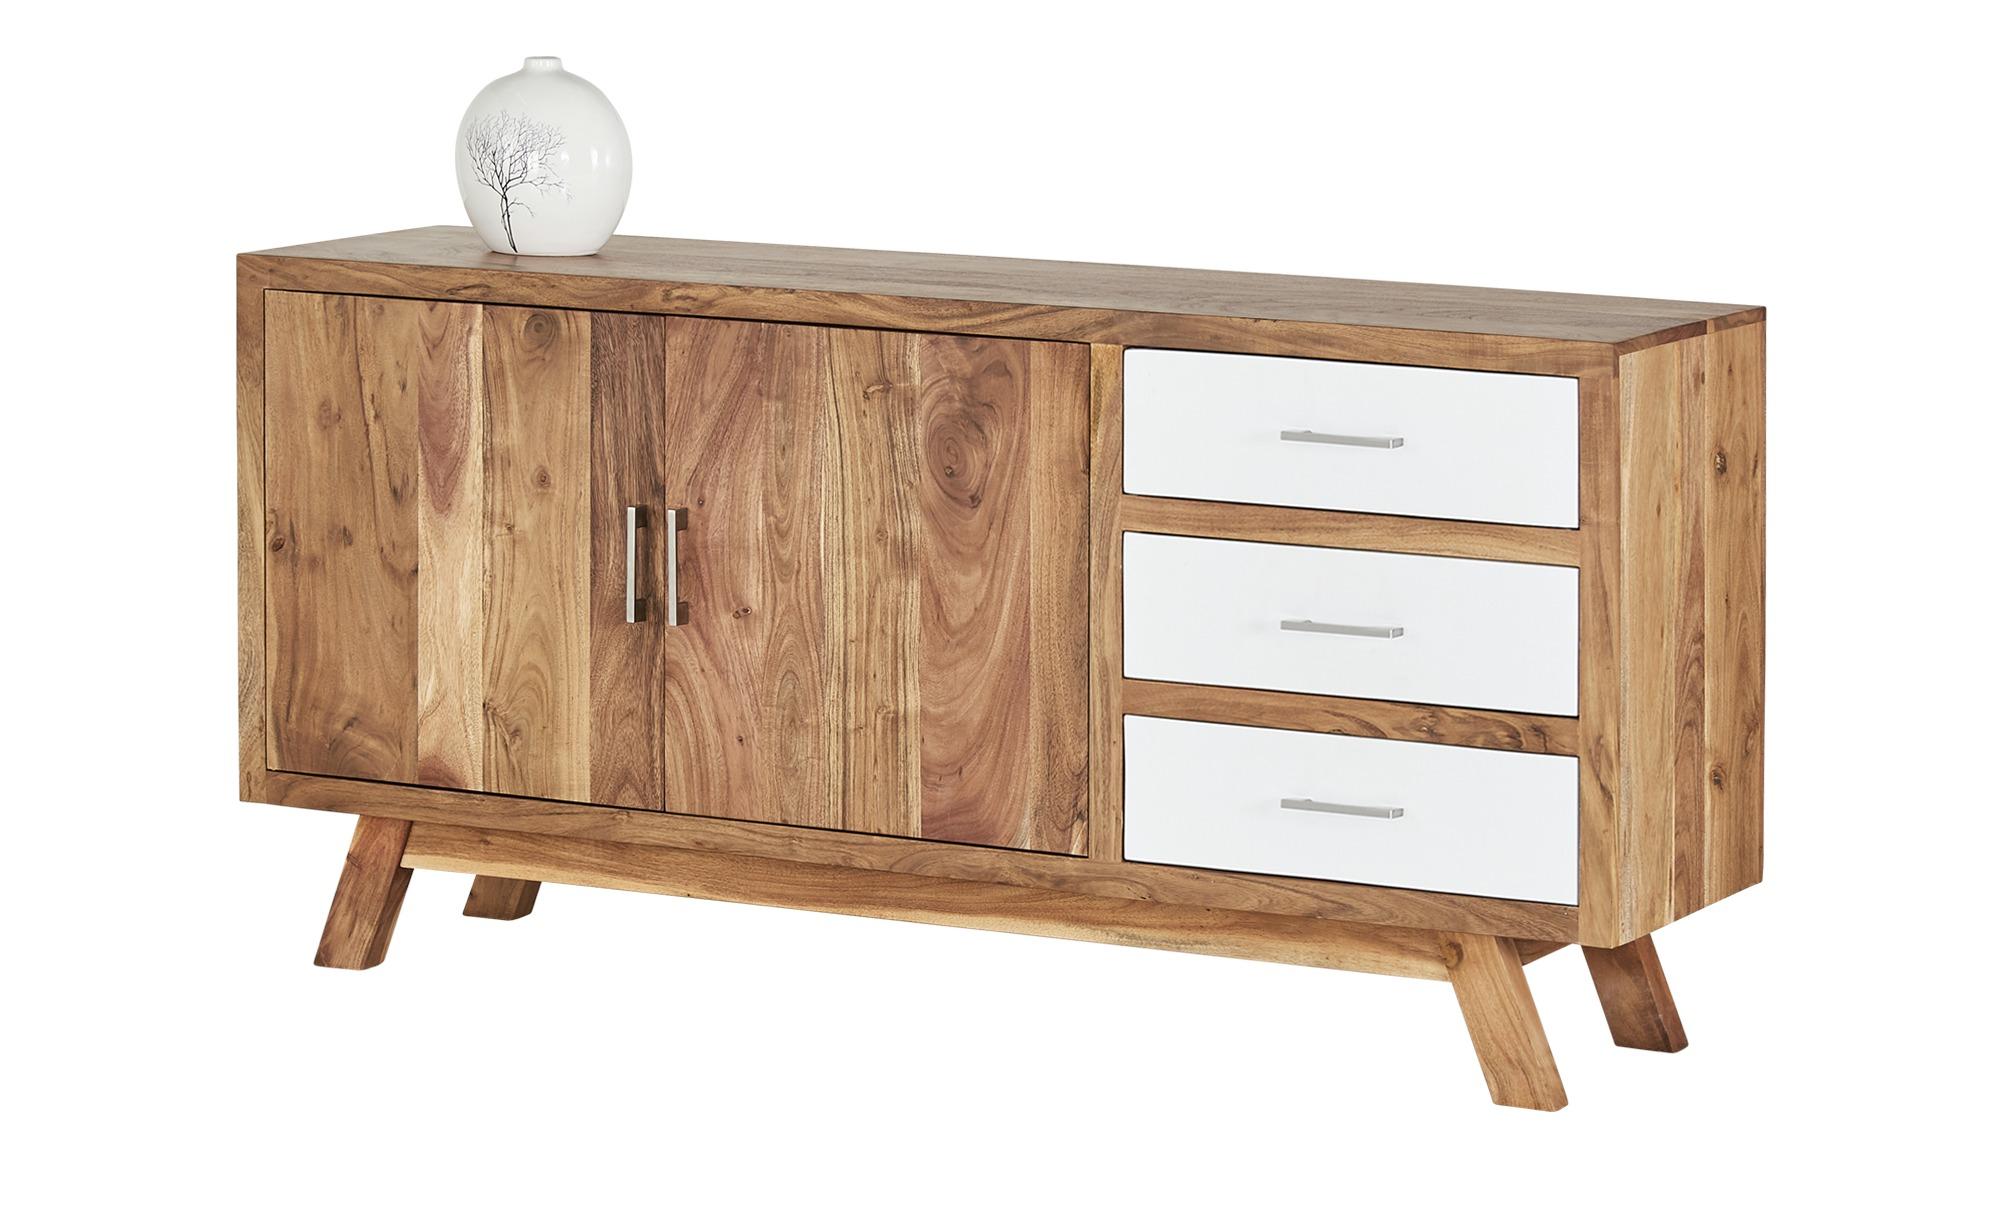 woodford sideboard washington breite 160 cm h he 78 cm online kaufen bei woonio. Black Bedroom Furniture Sets. Home Design Ideas